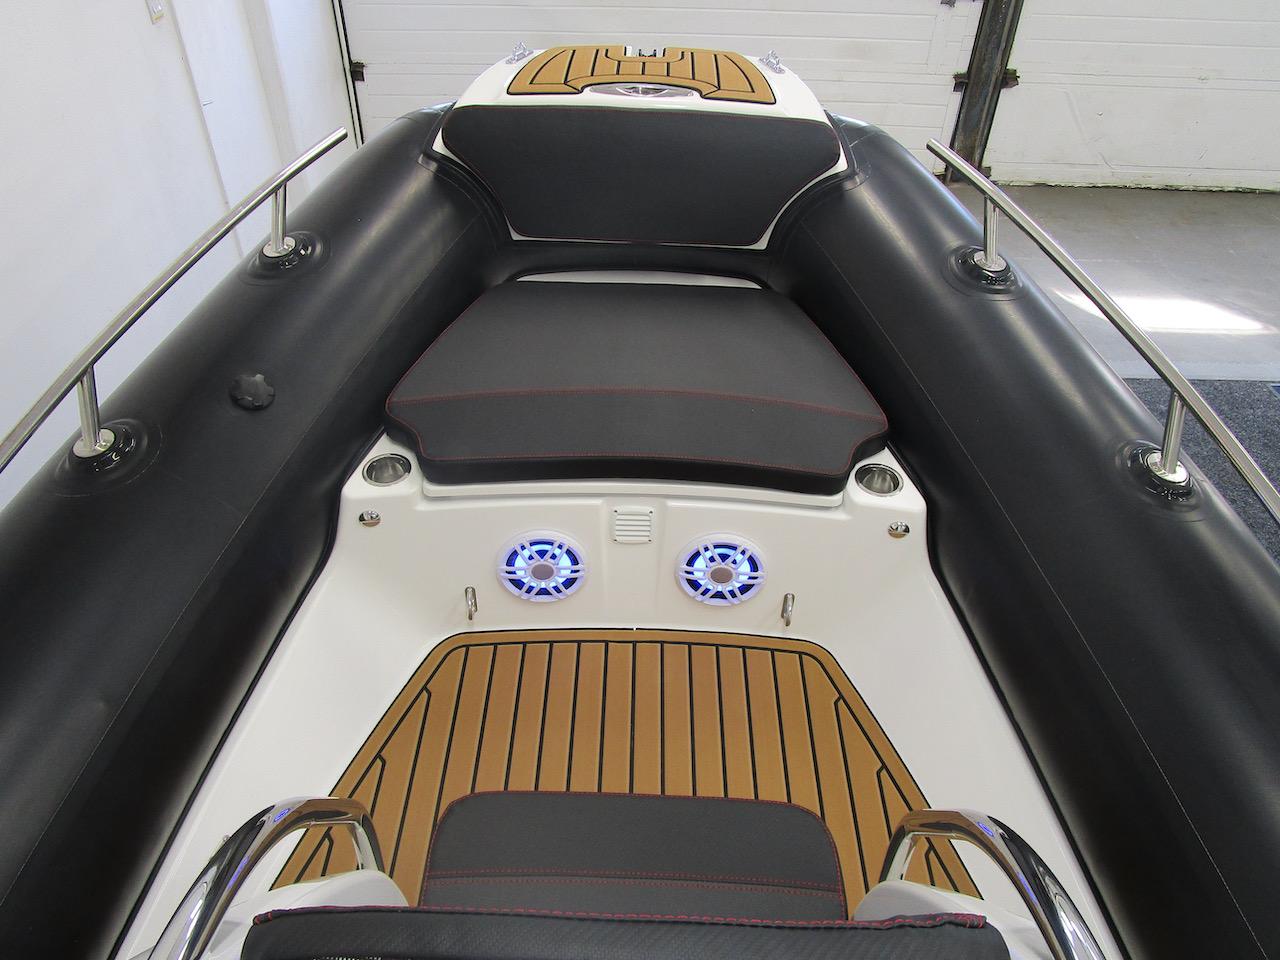 Grand RIB Golden Line G650 anchor locker cushion fitted